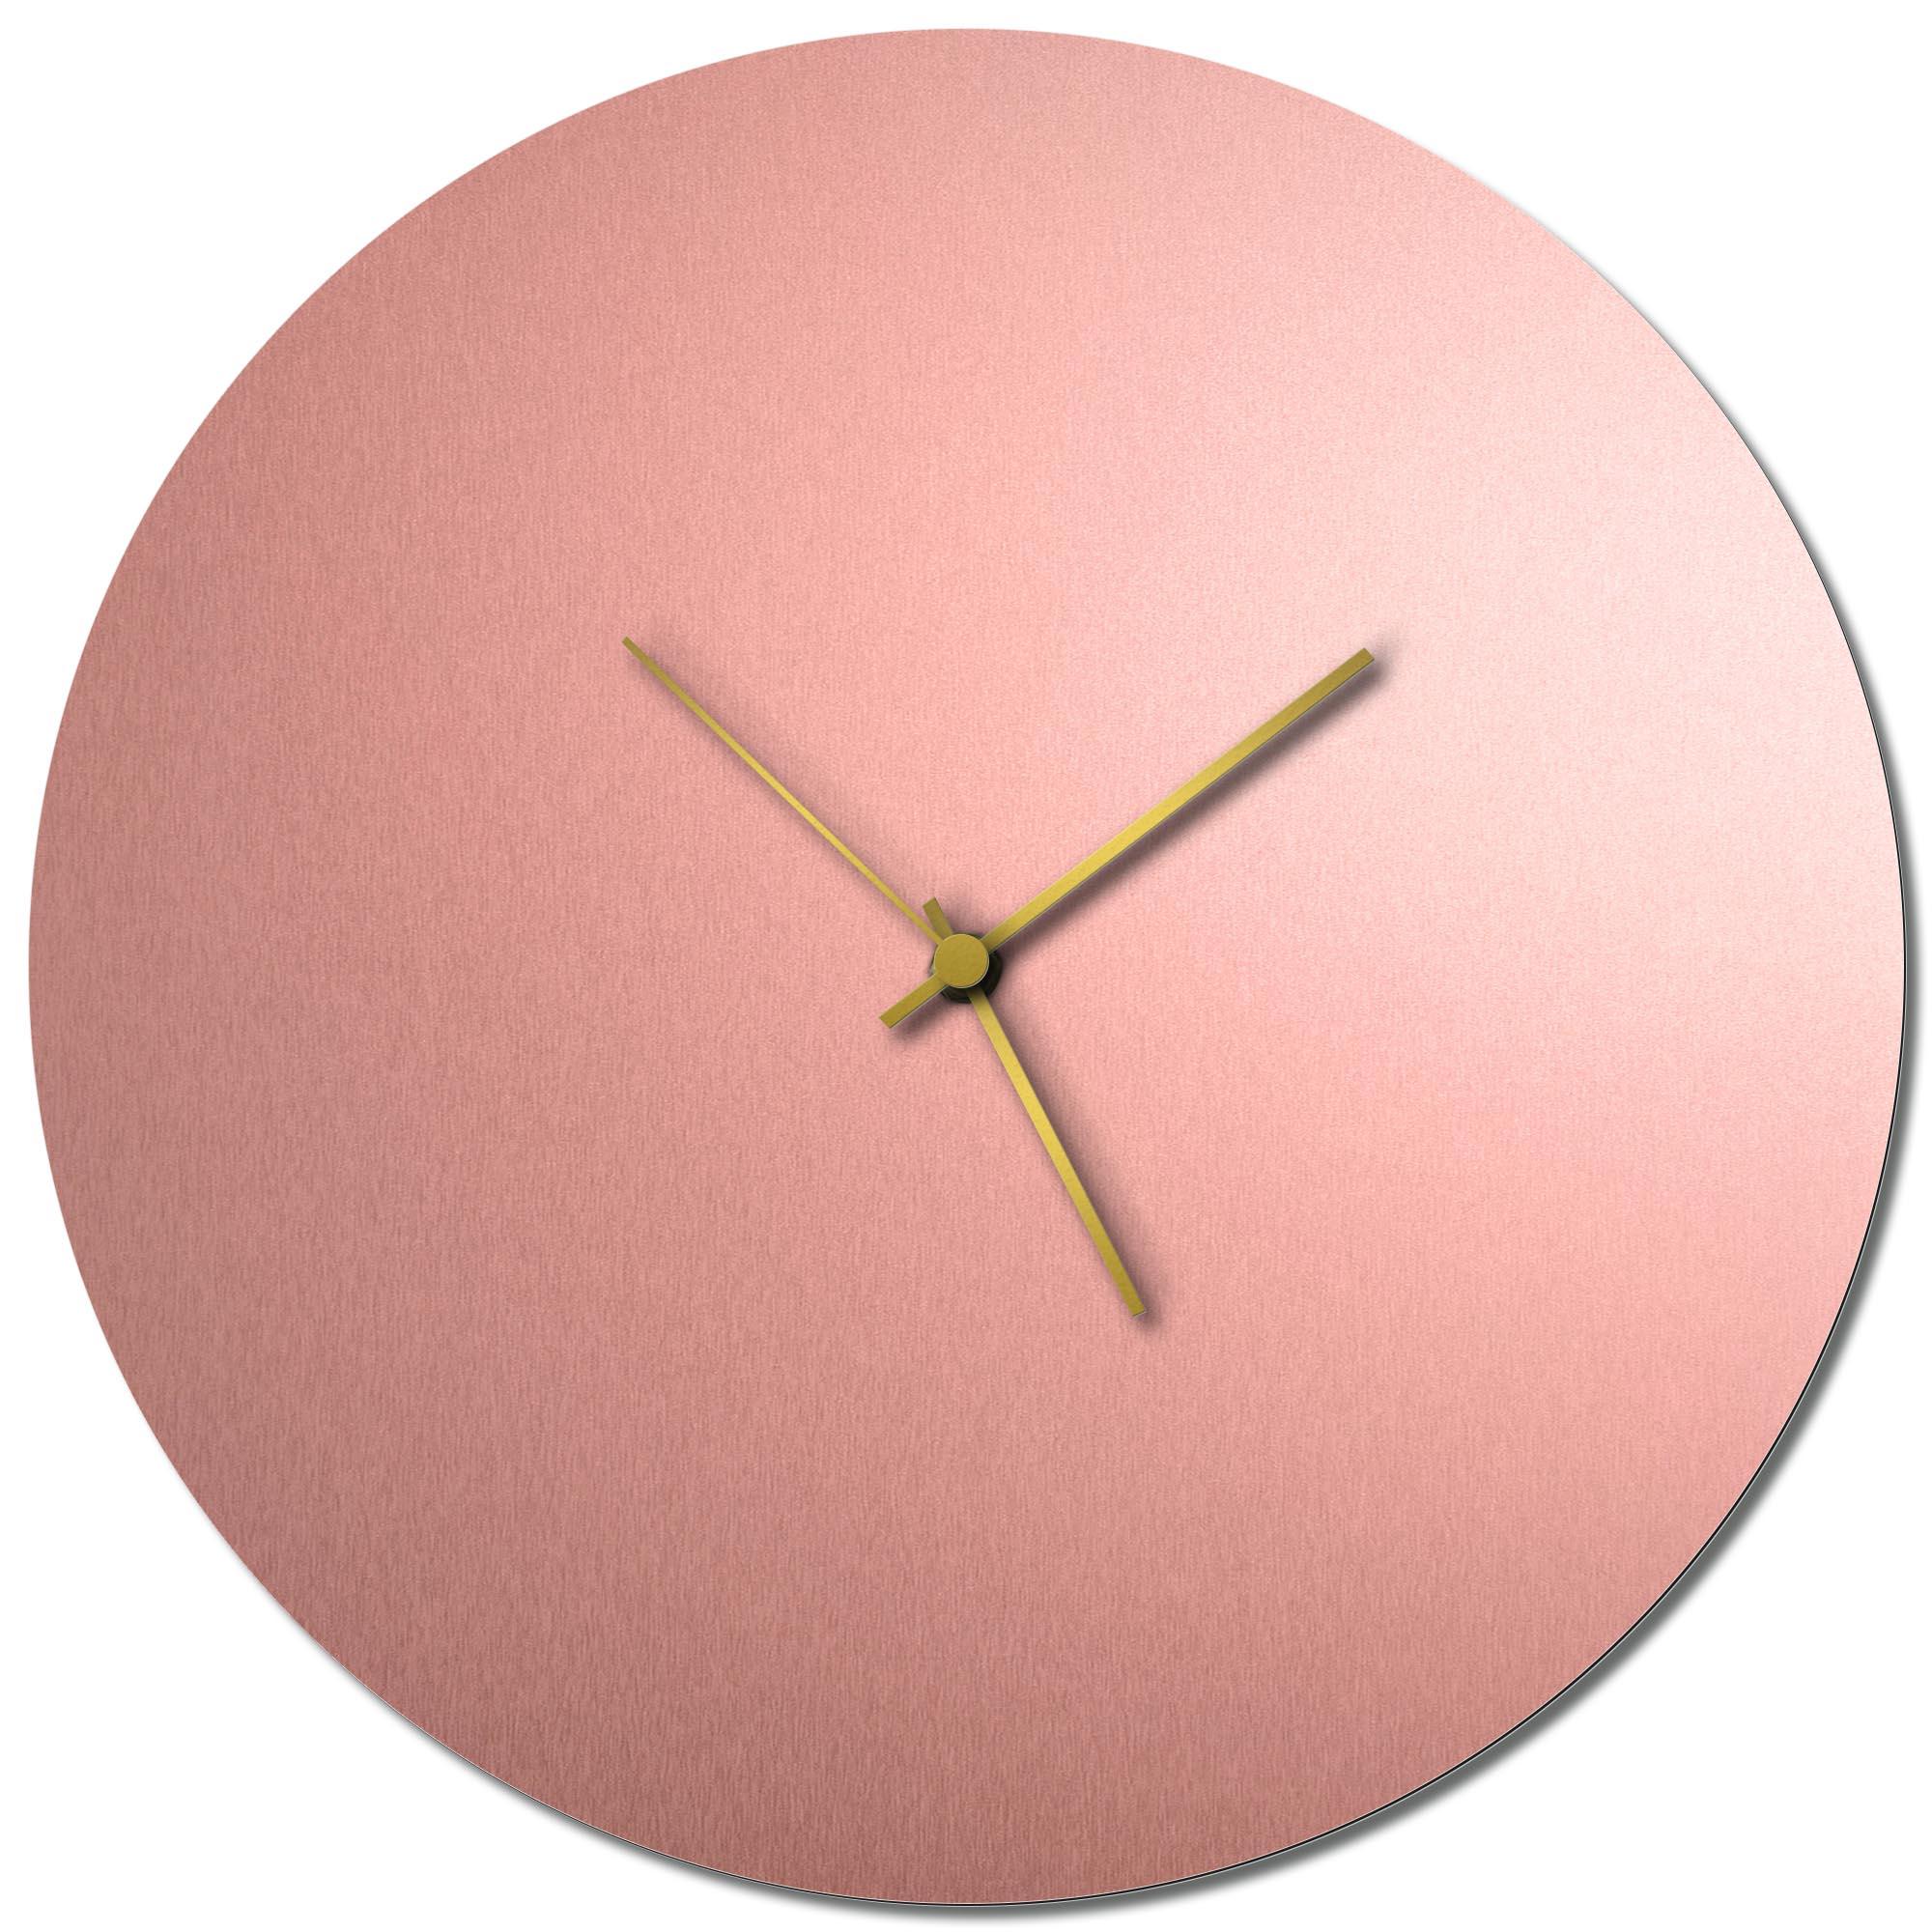 Adam Schwoeppe 'Coppersmith Circle Clock Large Gold' Midcentury Modern Style Wall Clock